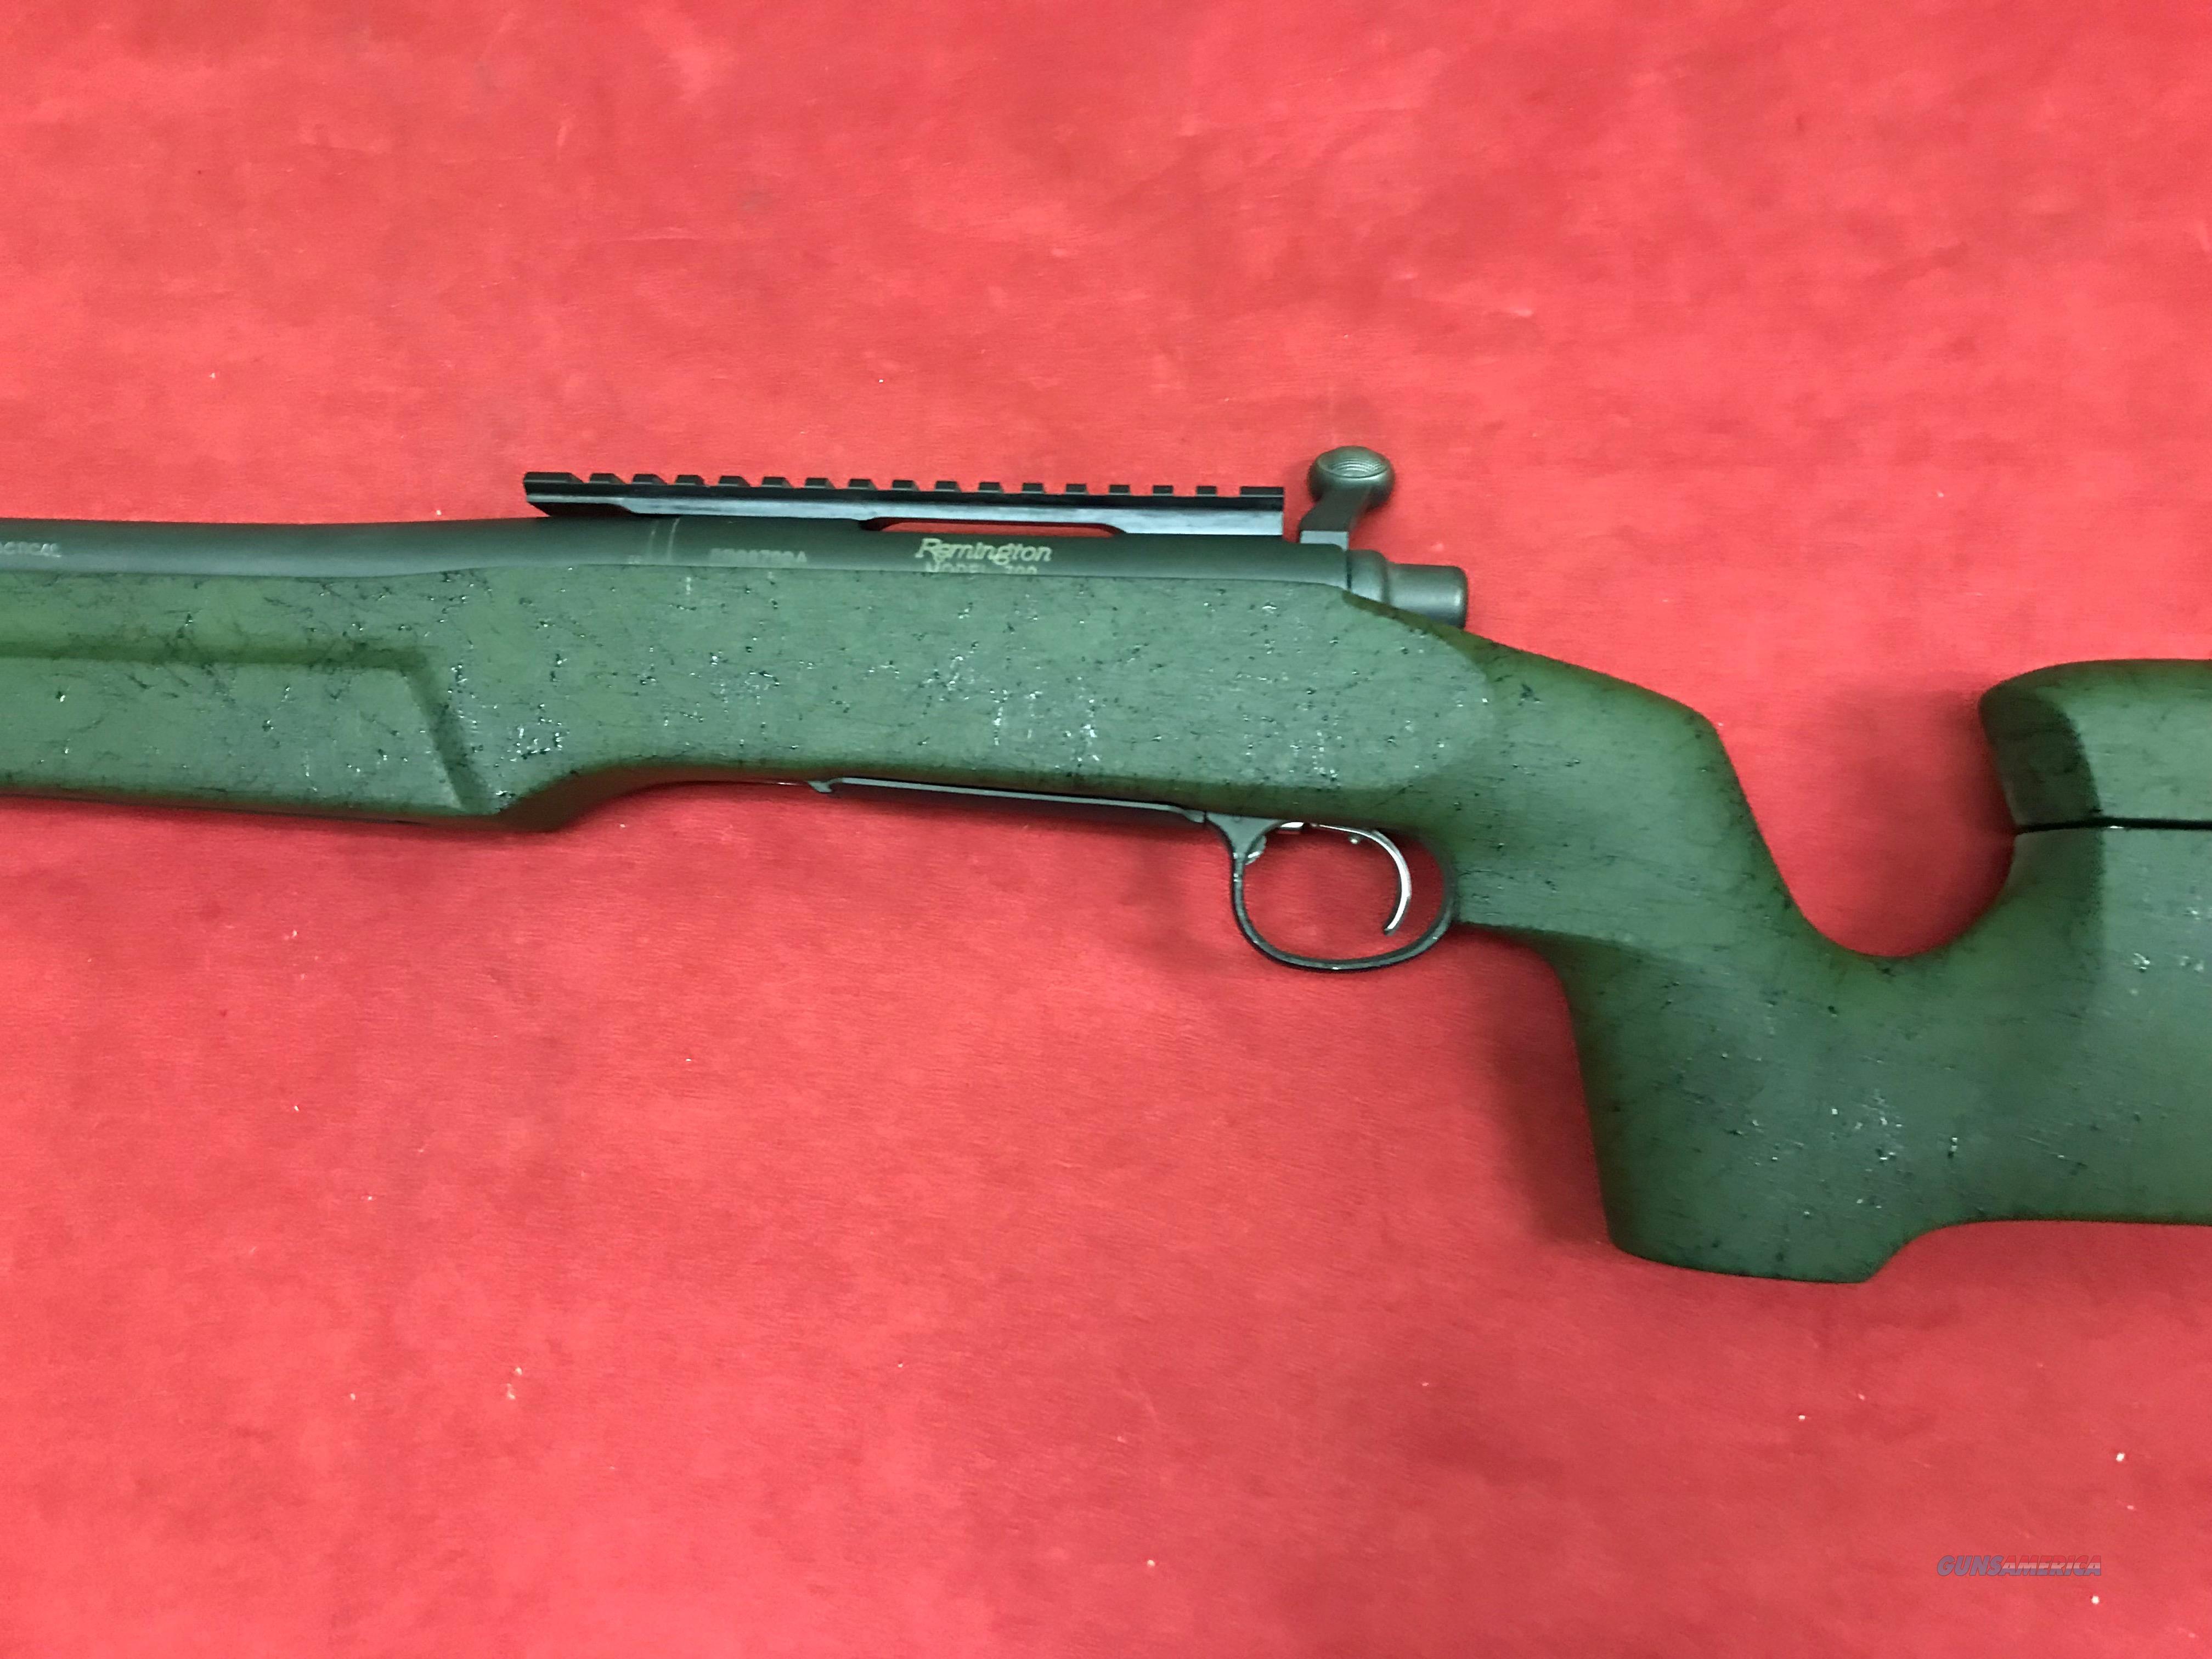 Remington 700 w/Custom stock, .308 win.  Guns > Rifles > Remington Rifles - Modern > Model 700 > Tactical